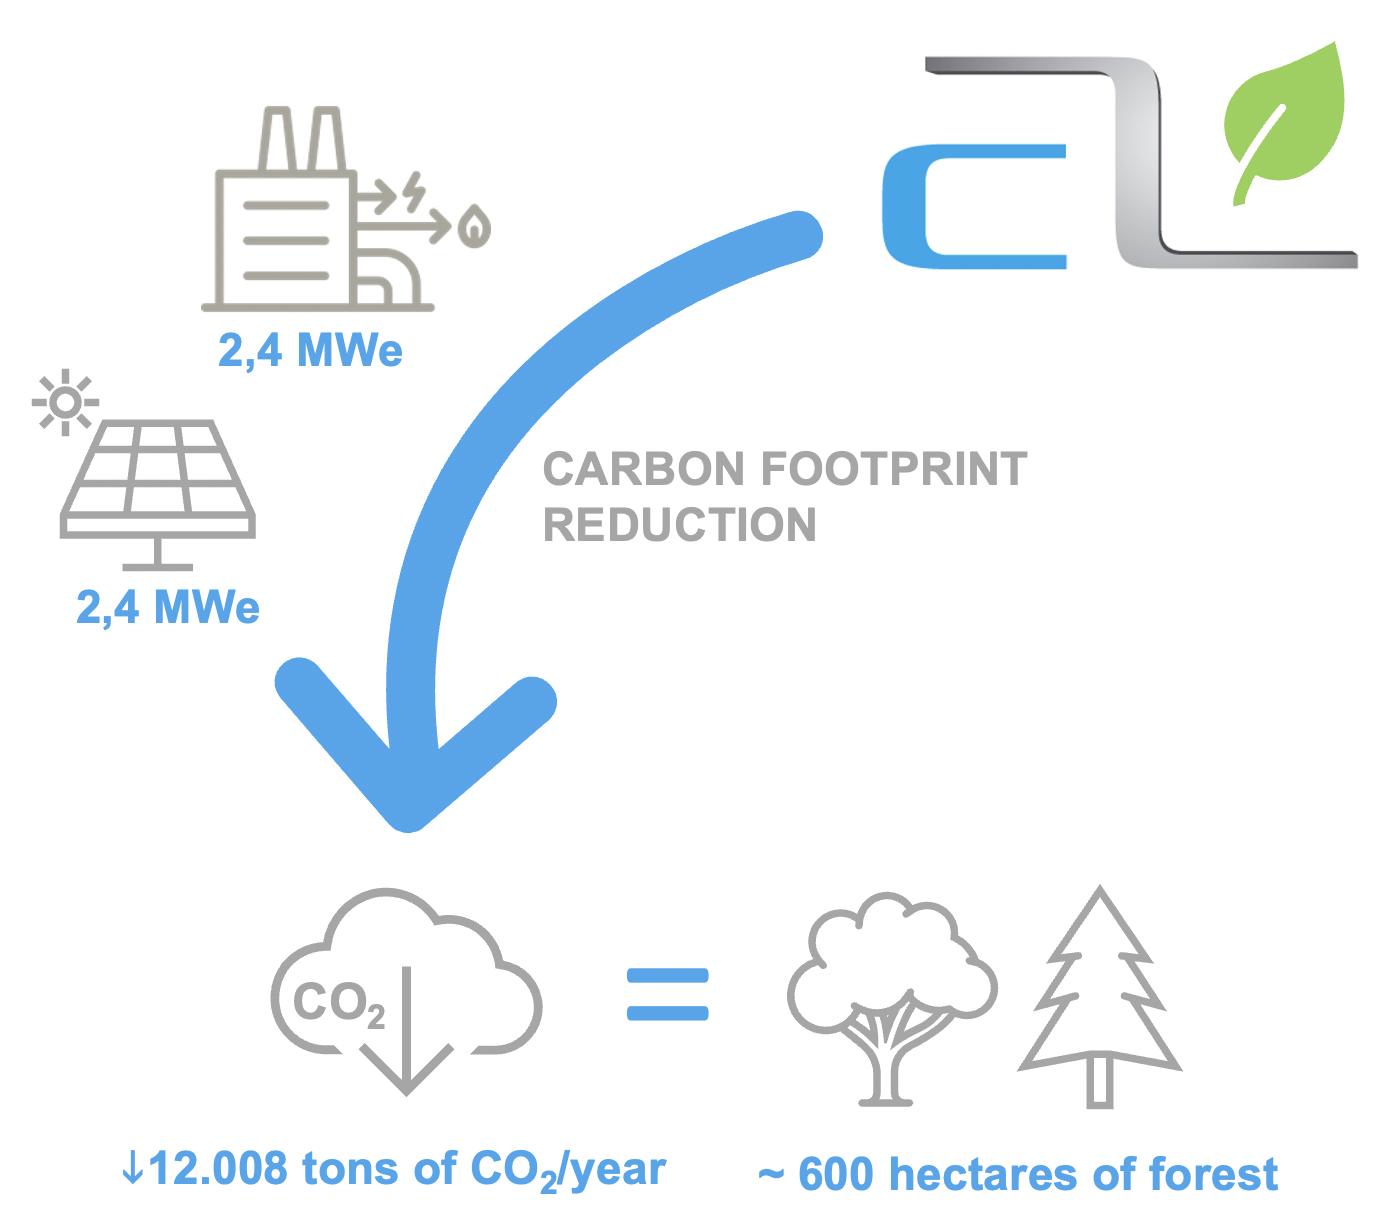 carbon_footprint_reduction_albatros